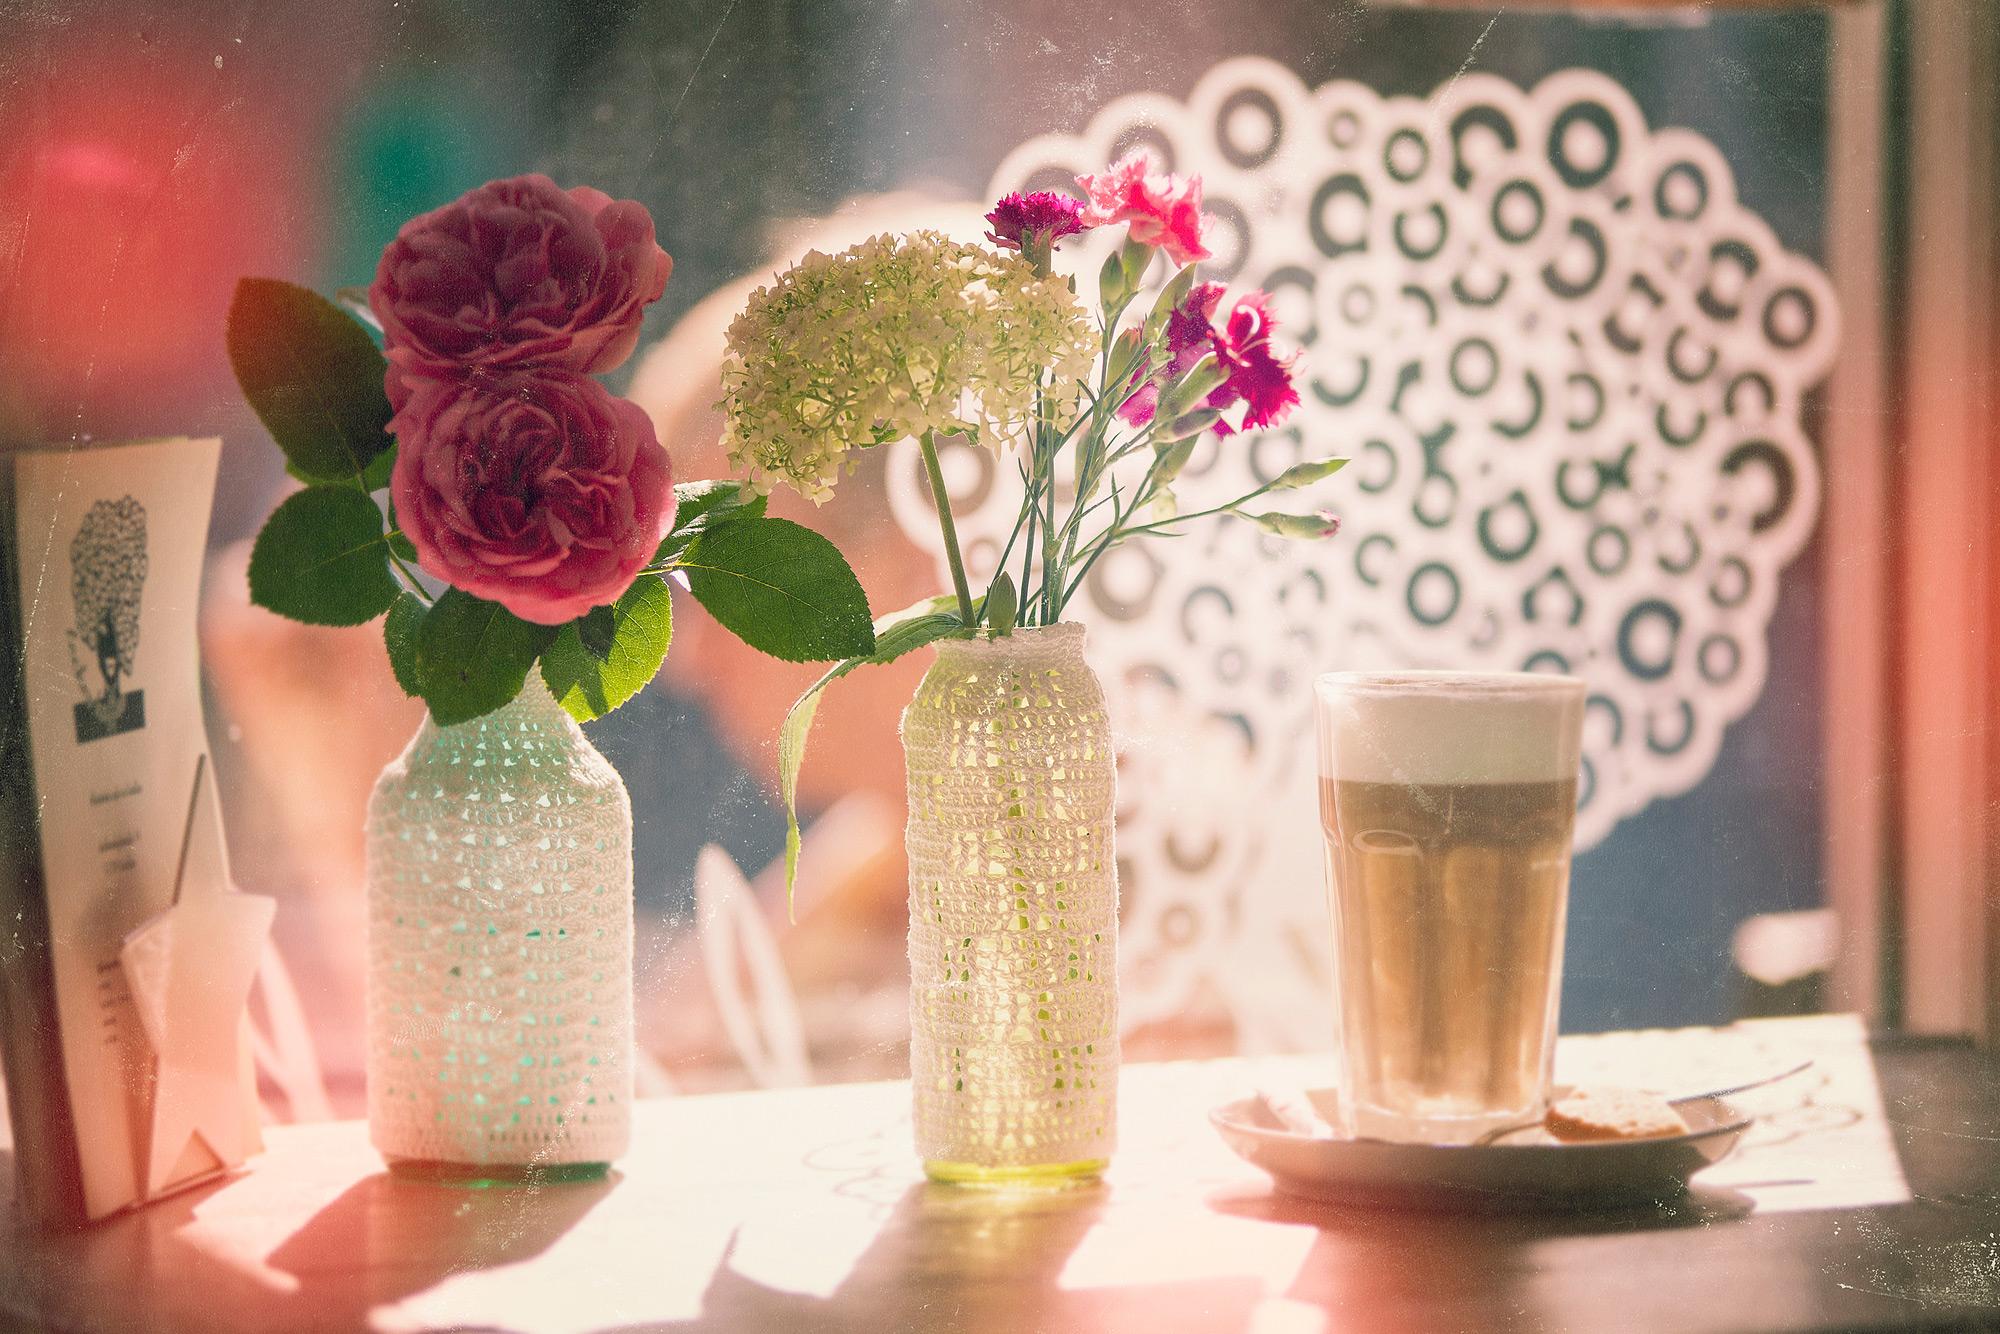 lecker-kaffee-lindlar-003.jpg